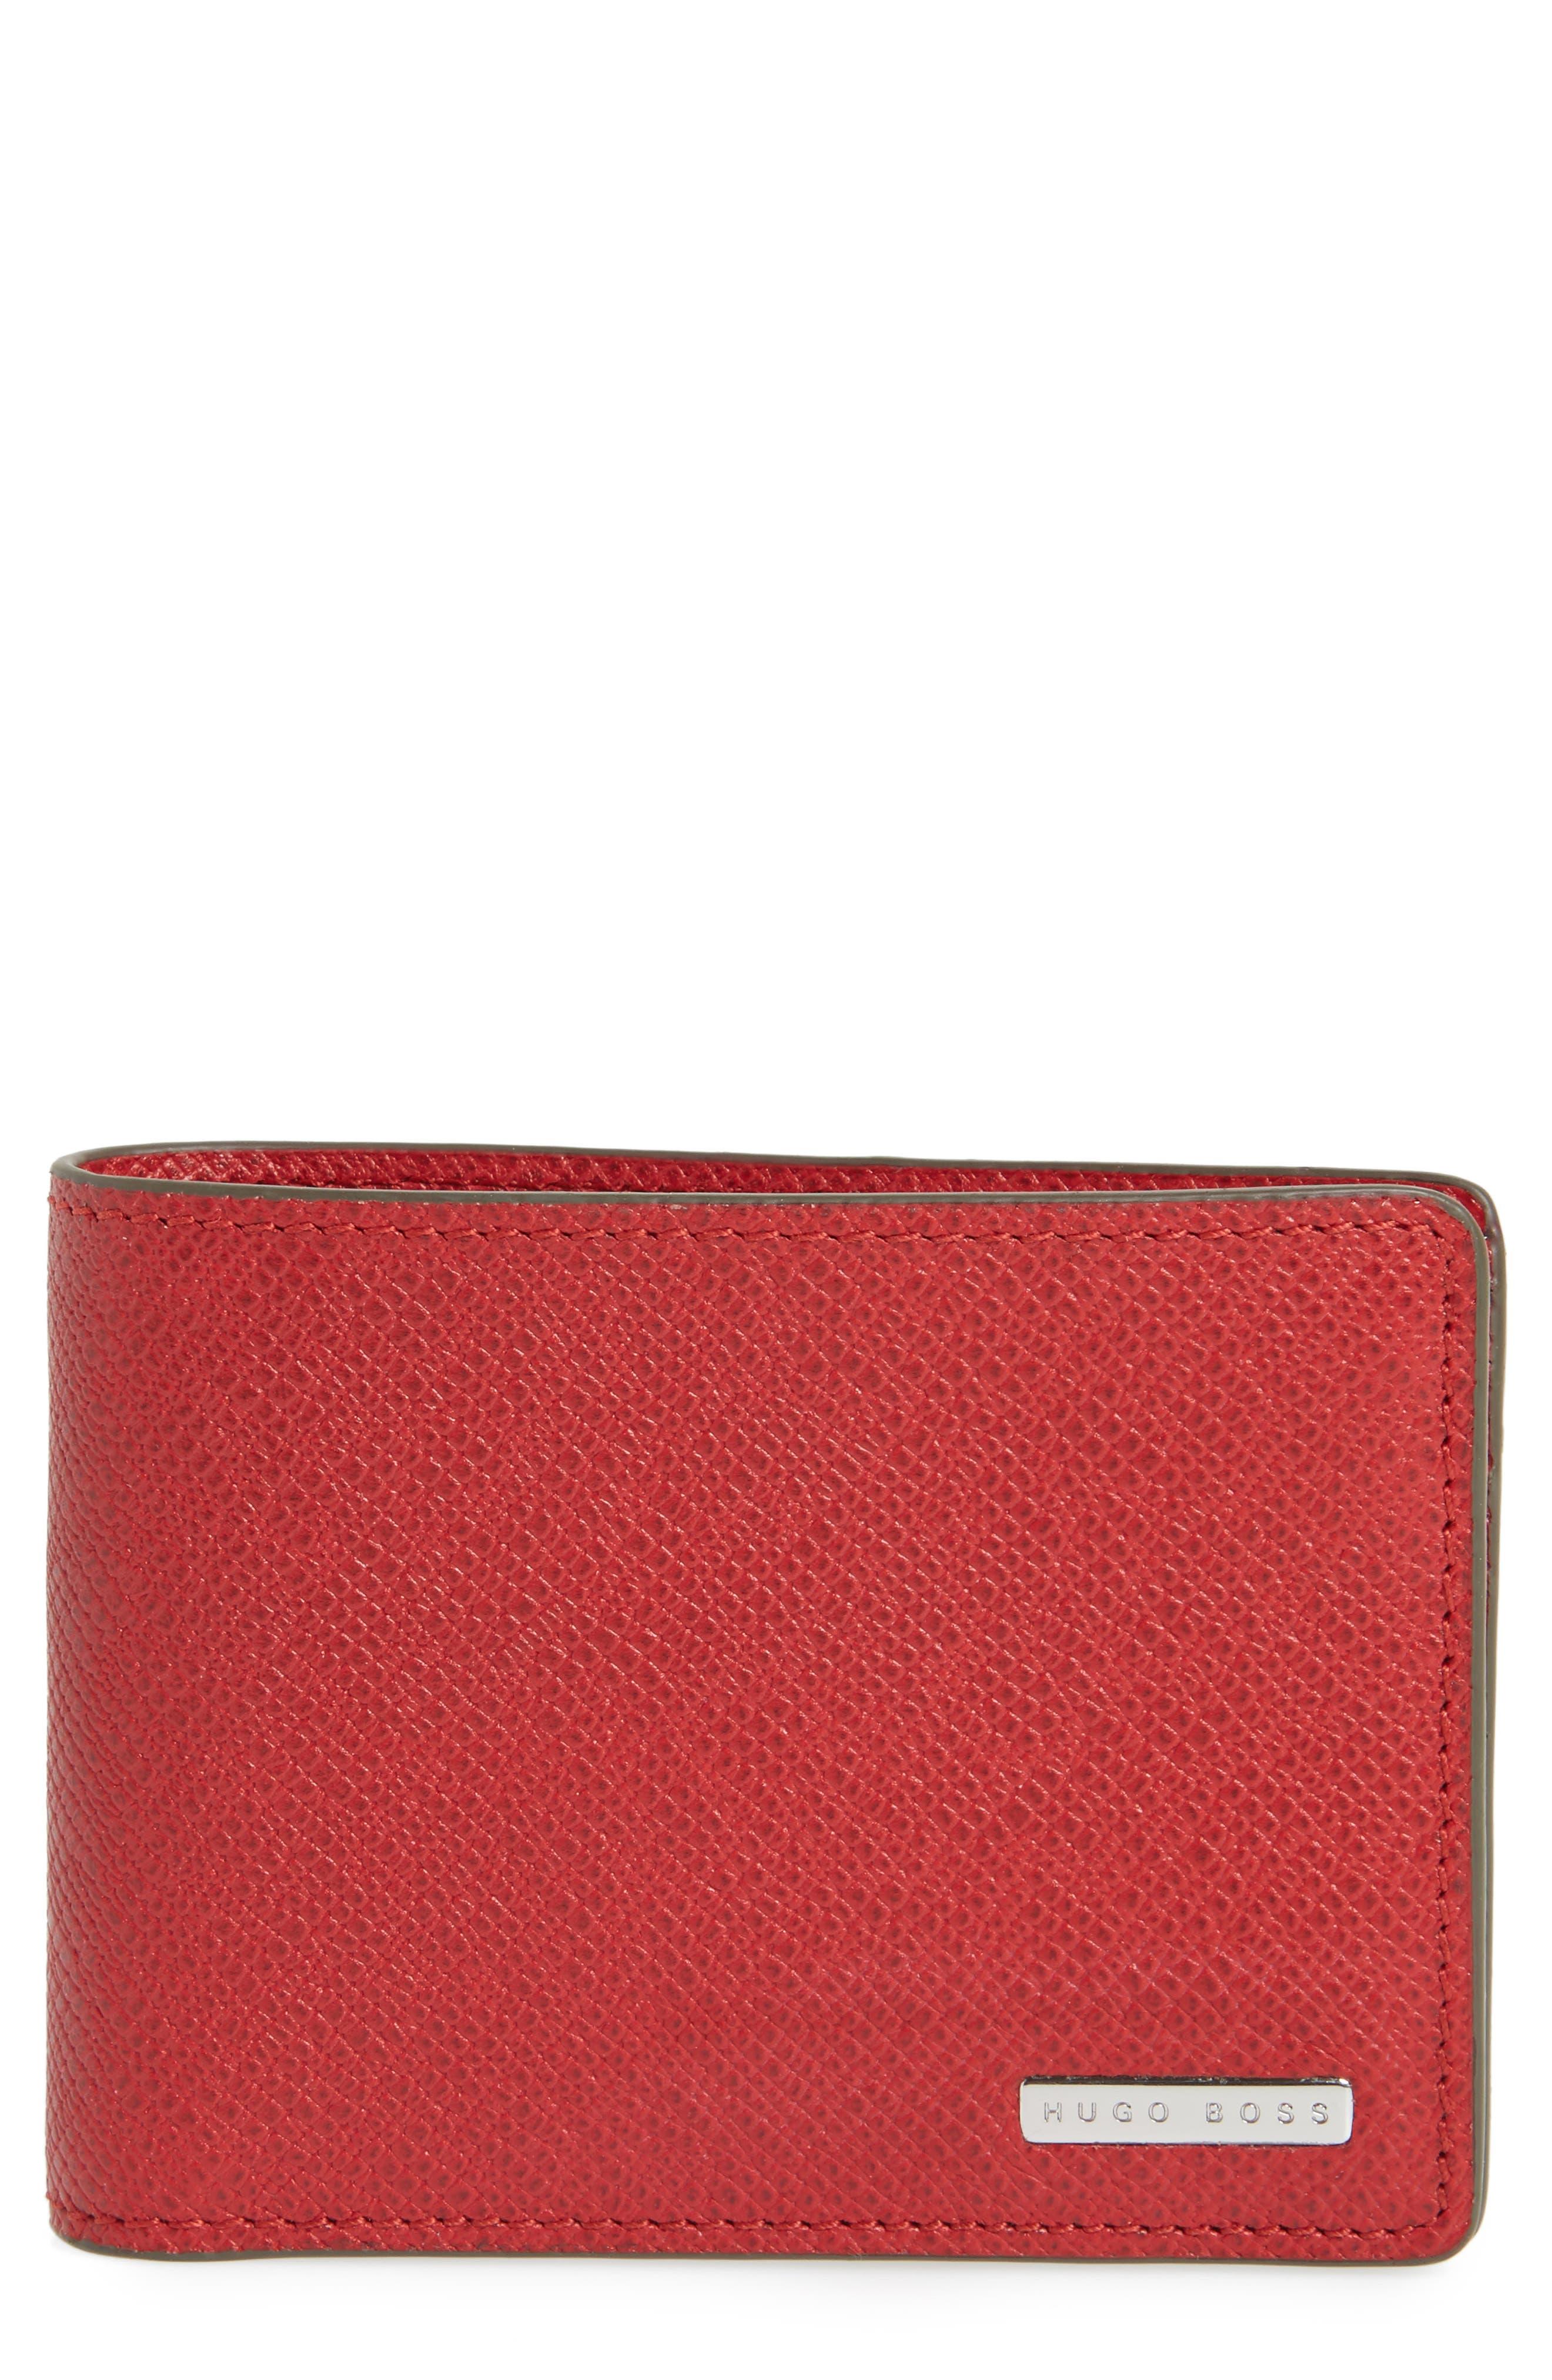 Main Image - BOSS 'Signature' Bifold Wallet